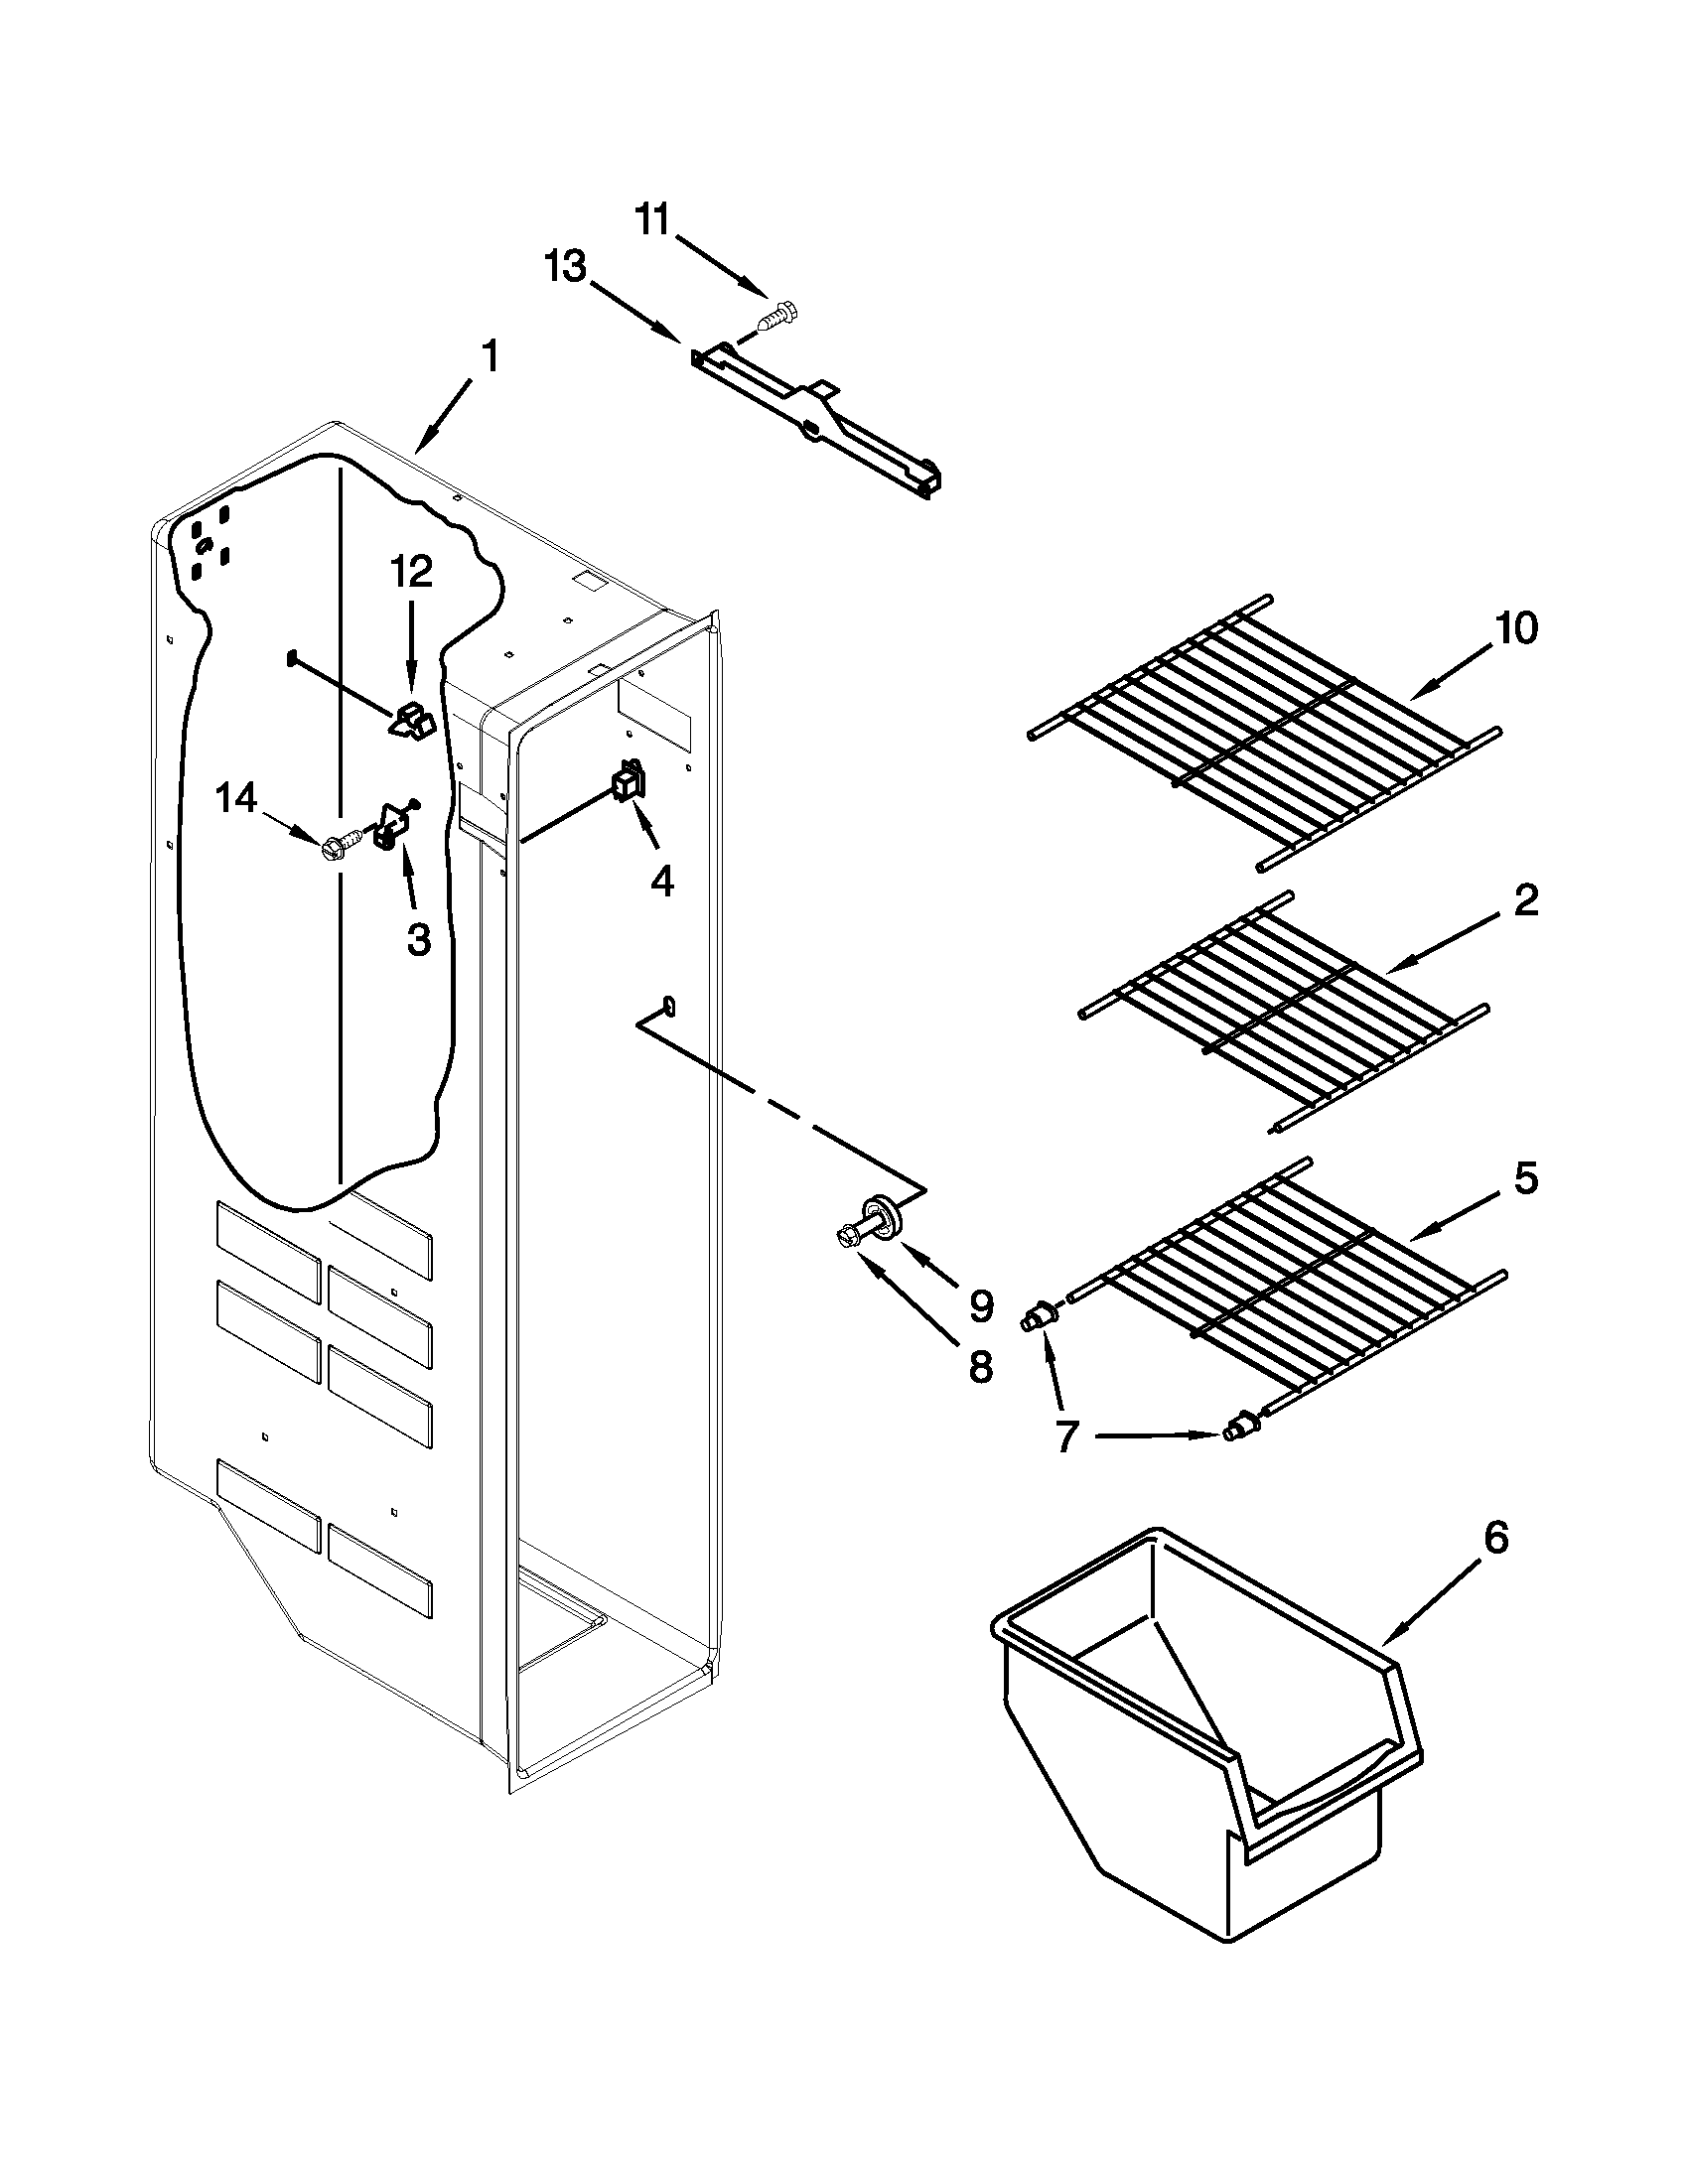 Kenmore model 10651123210 side-by-side refrigerator